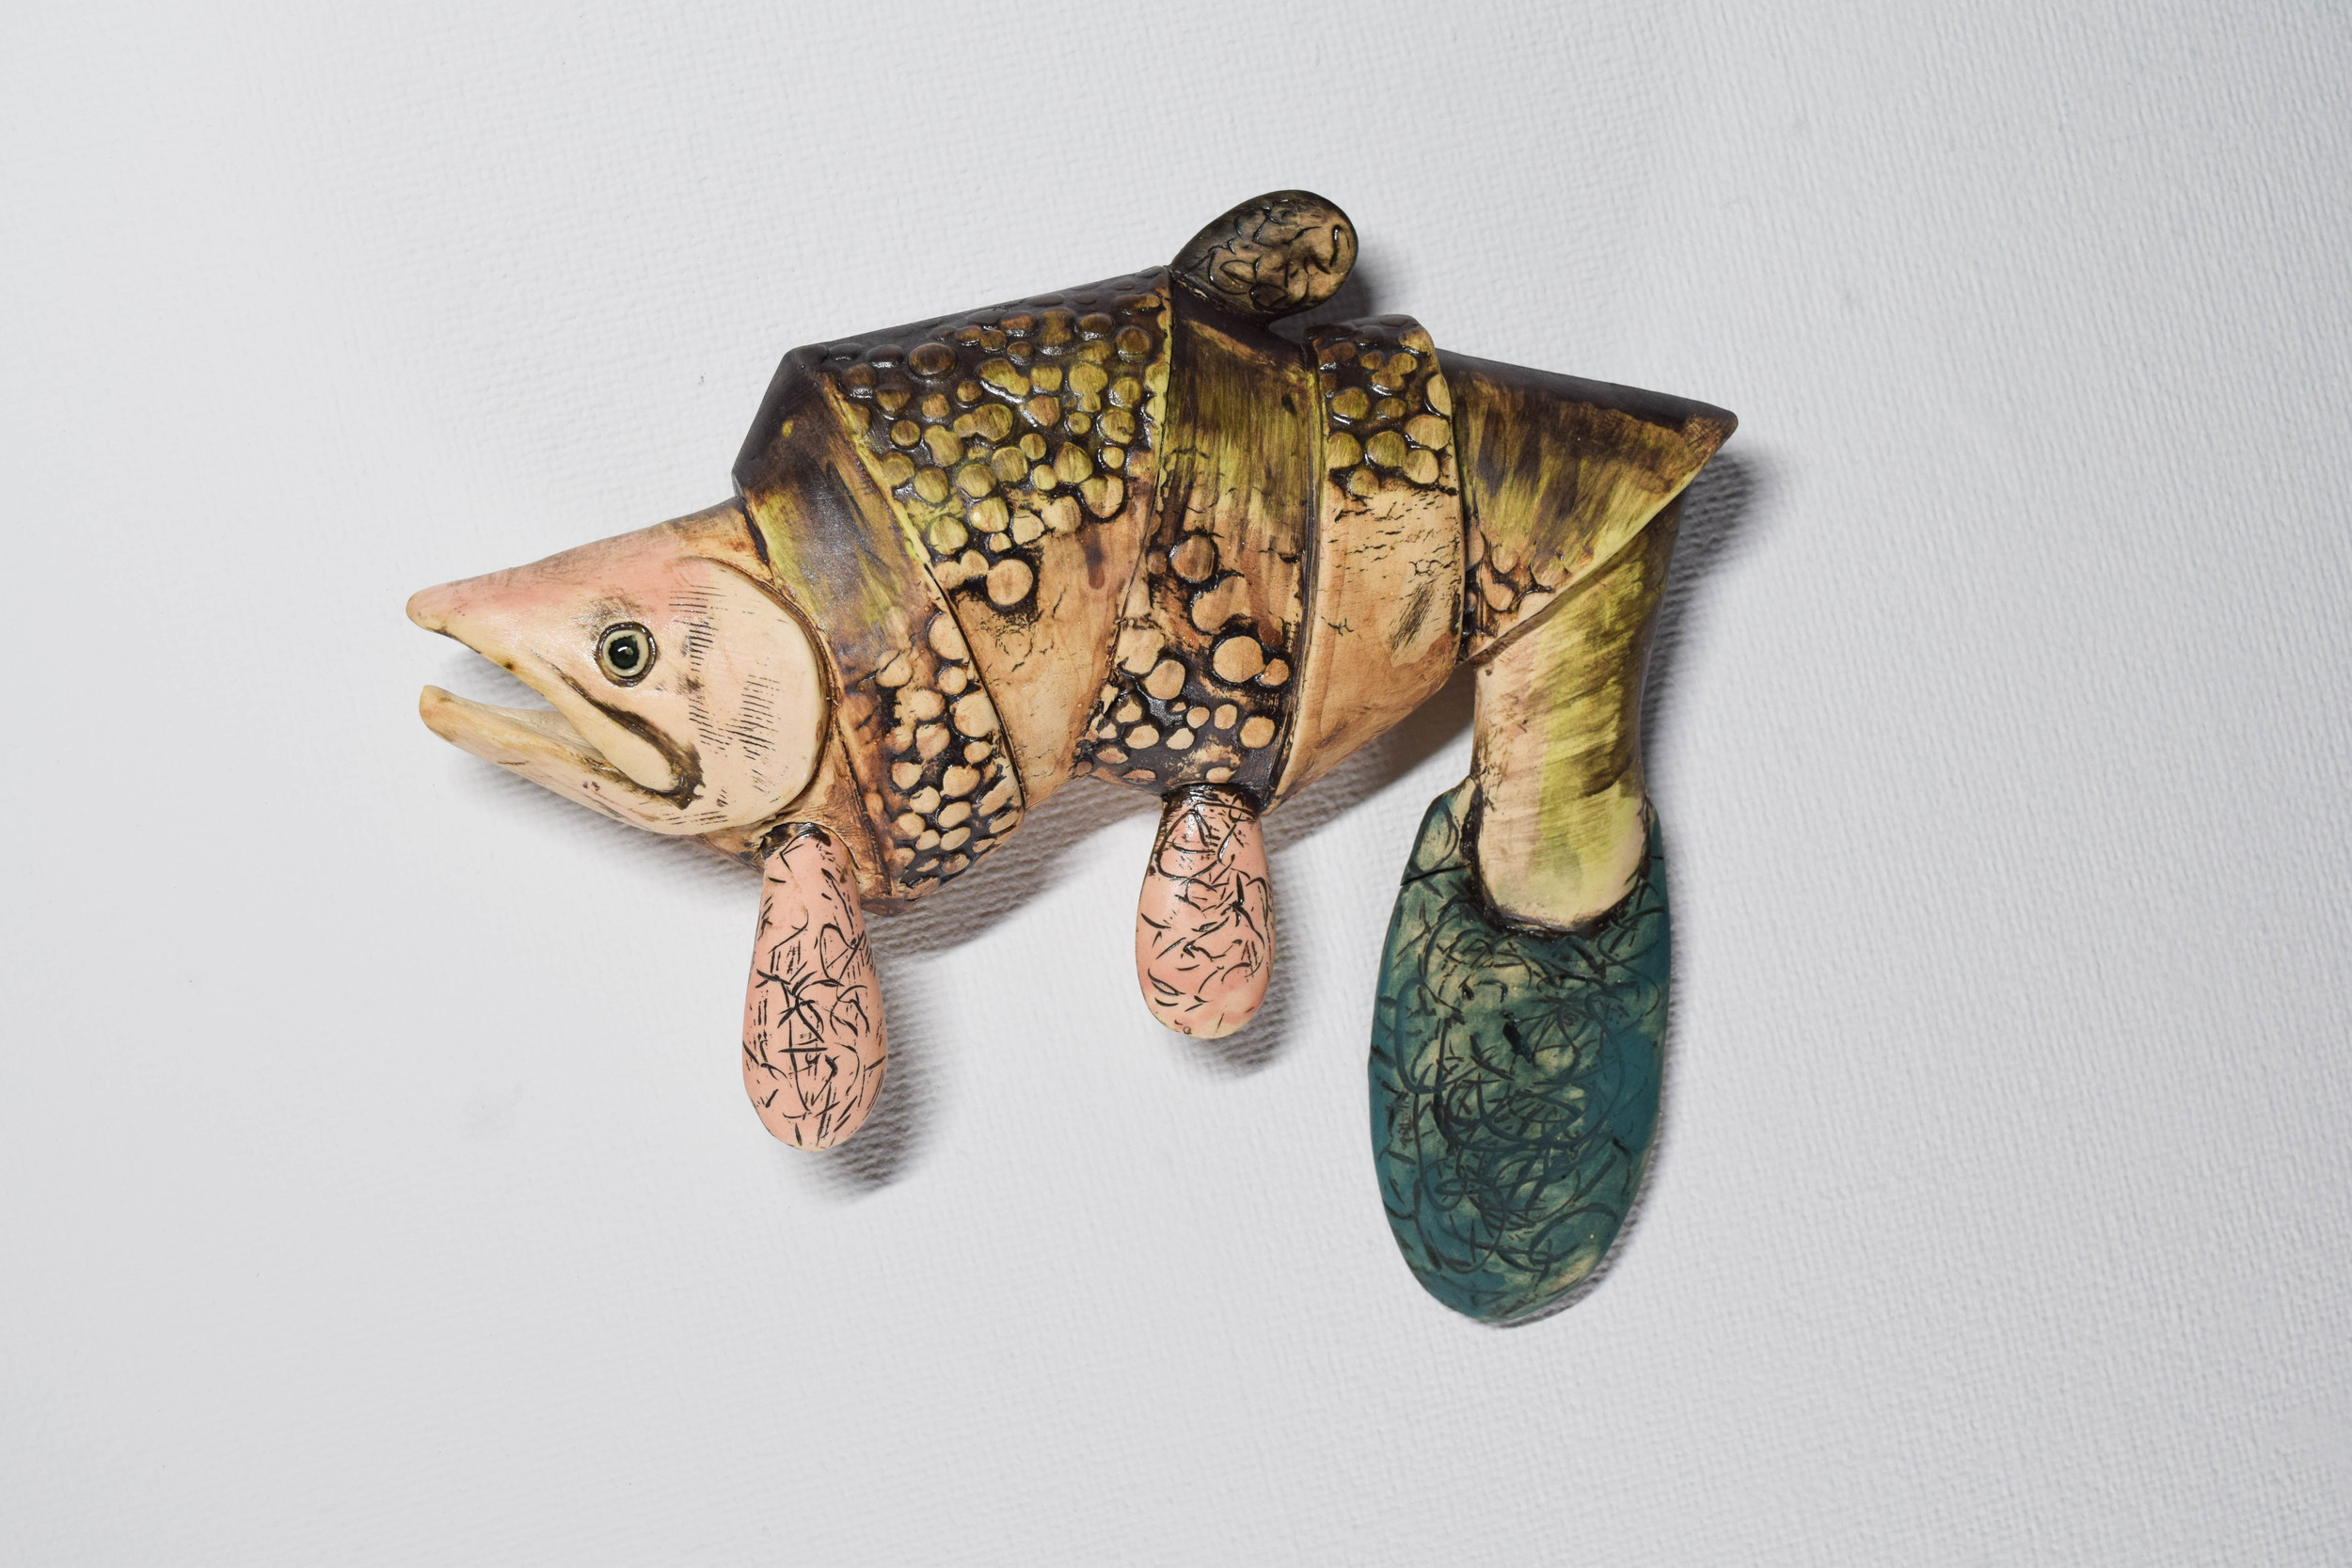 Paddle-Fin Fish